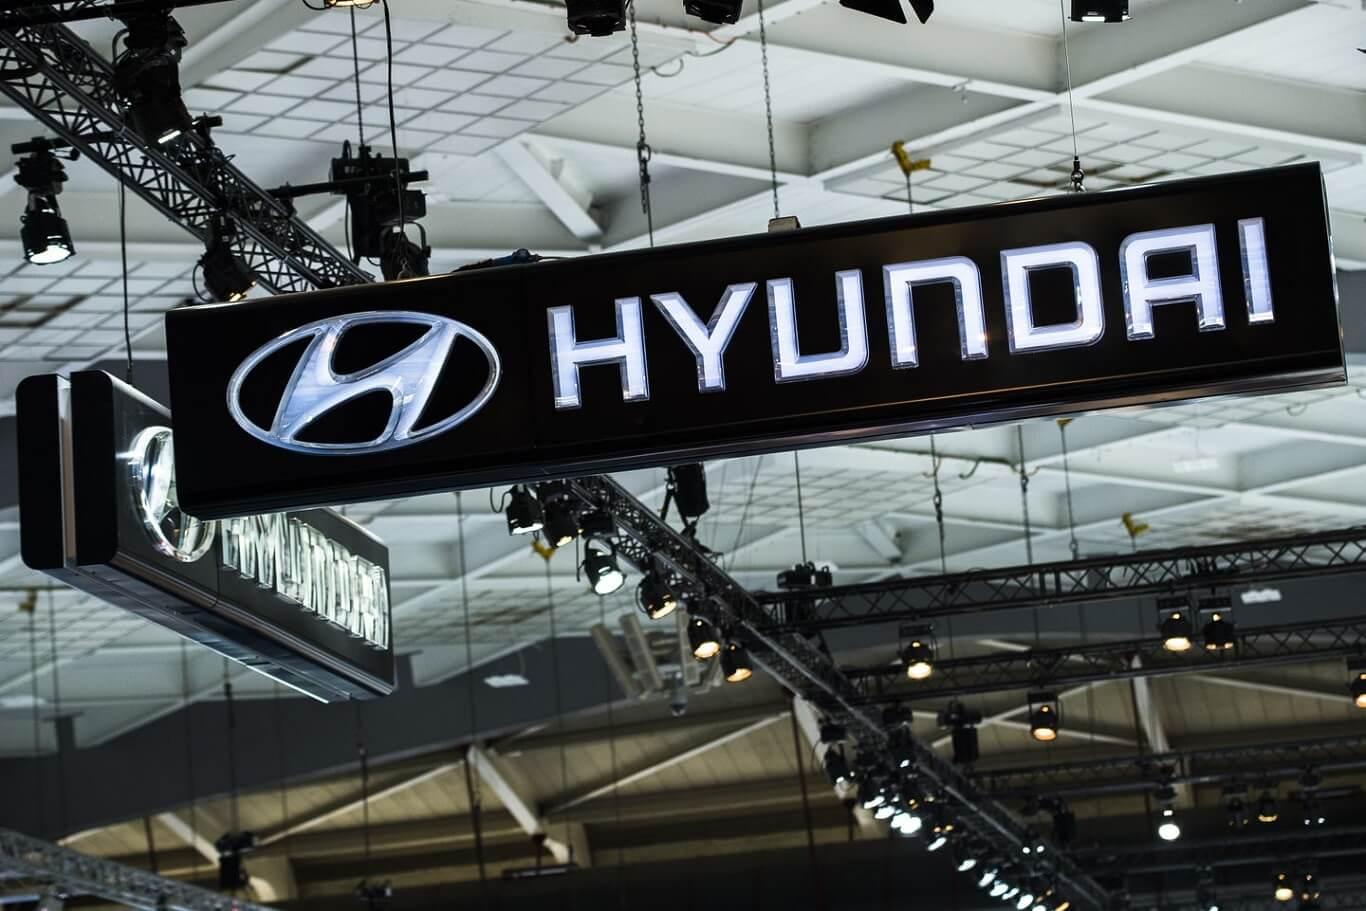 Hyundai bumper-to-bumper warranty